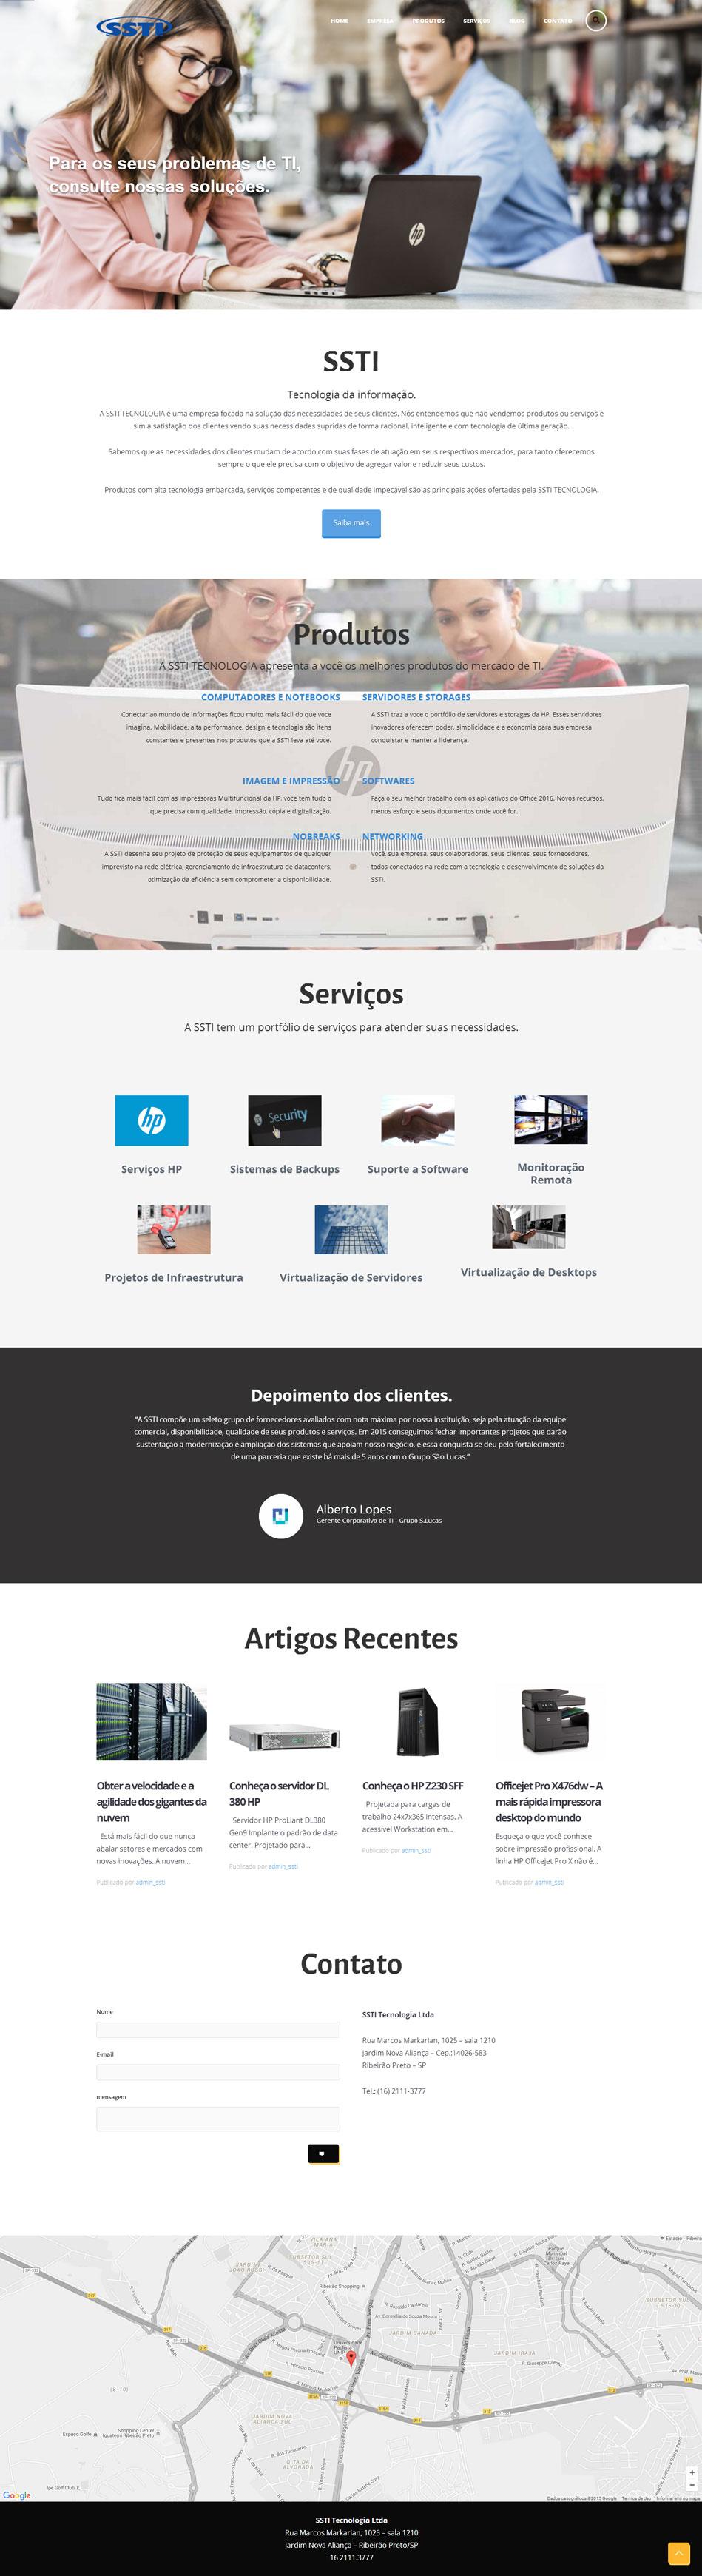 novo-site-SSTI-onflag